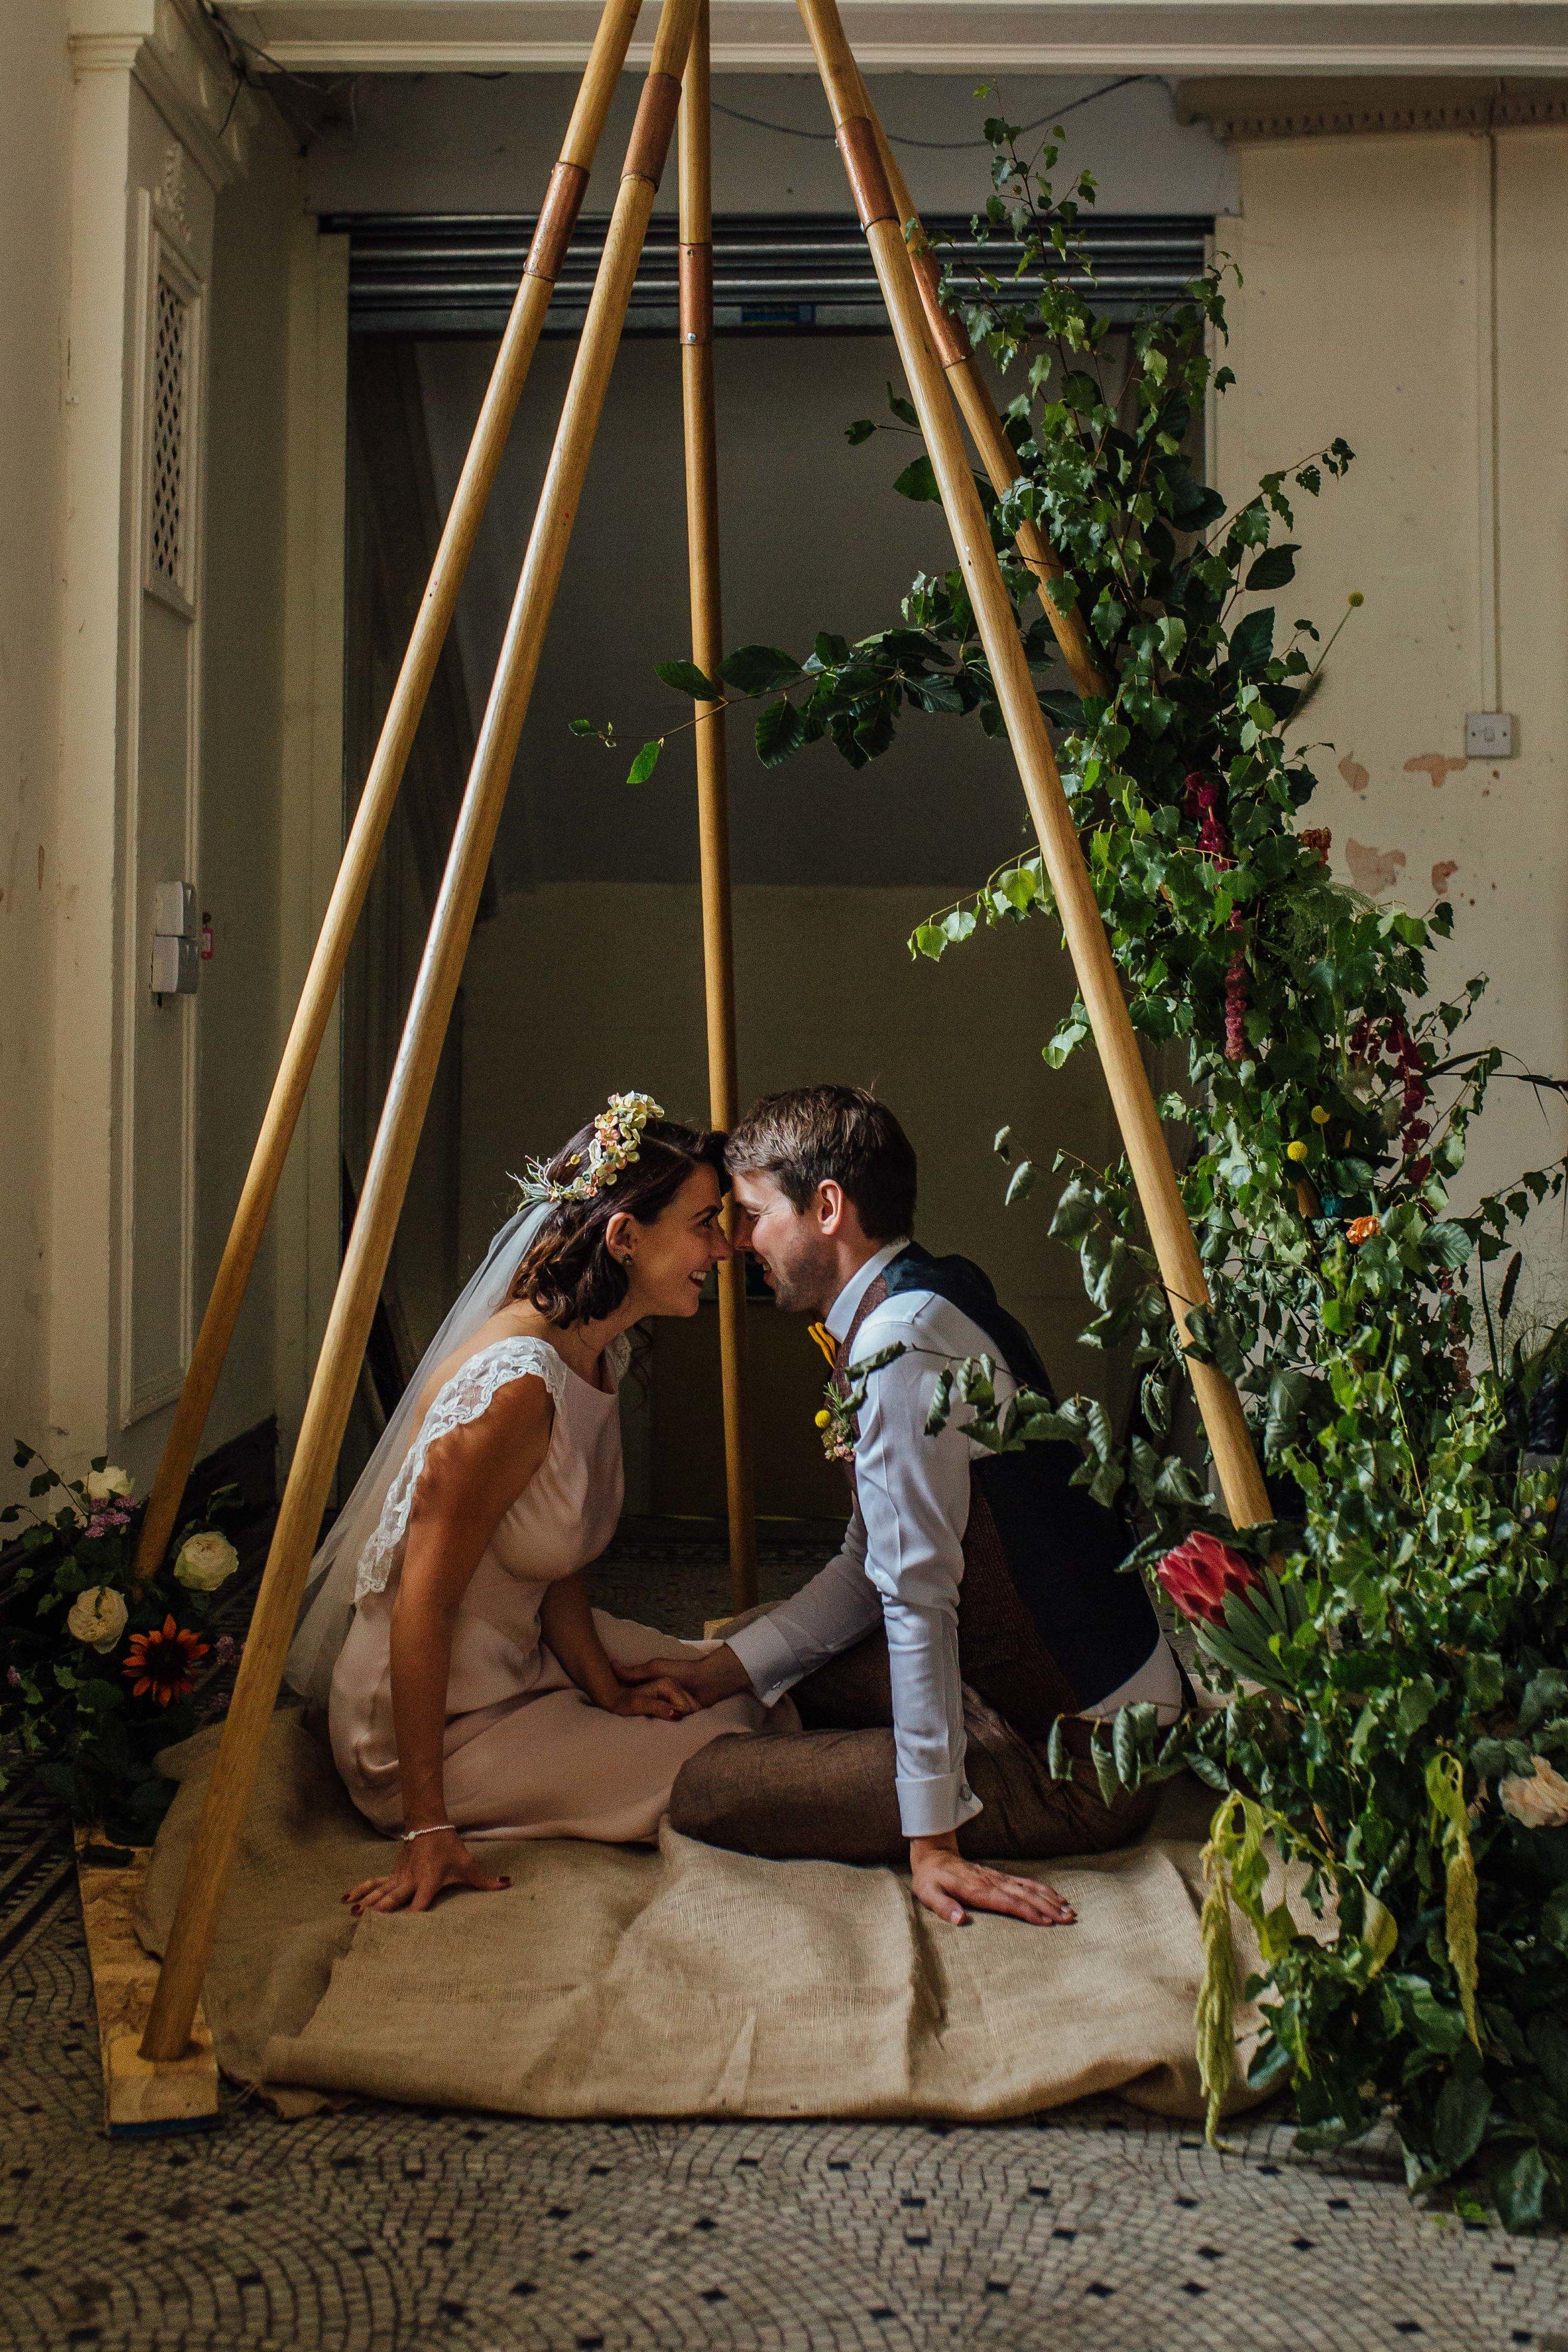 Katy-Bespoke-Veil-Sheffield-Wedding-Wes-Anderson-Susanna-Greening-Derbyshire-22